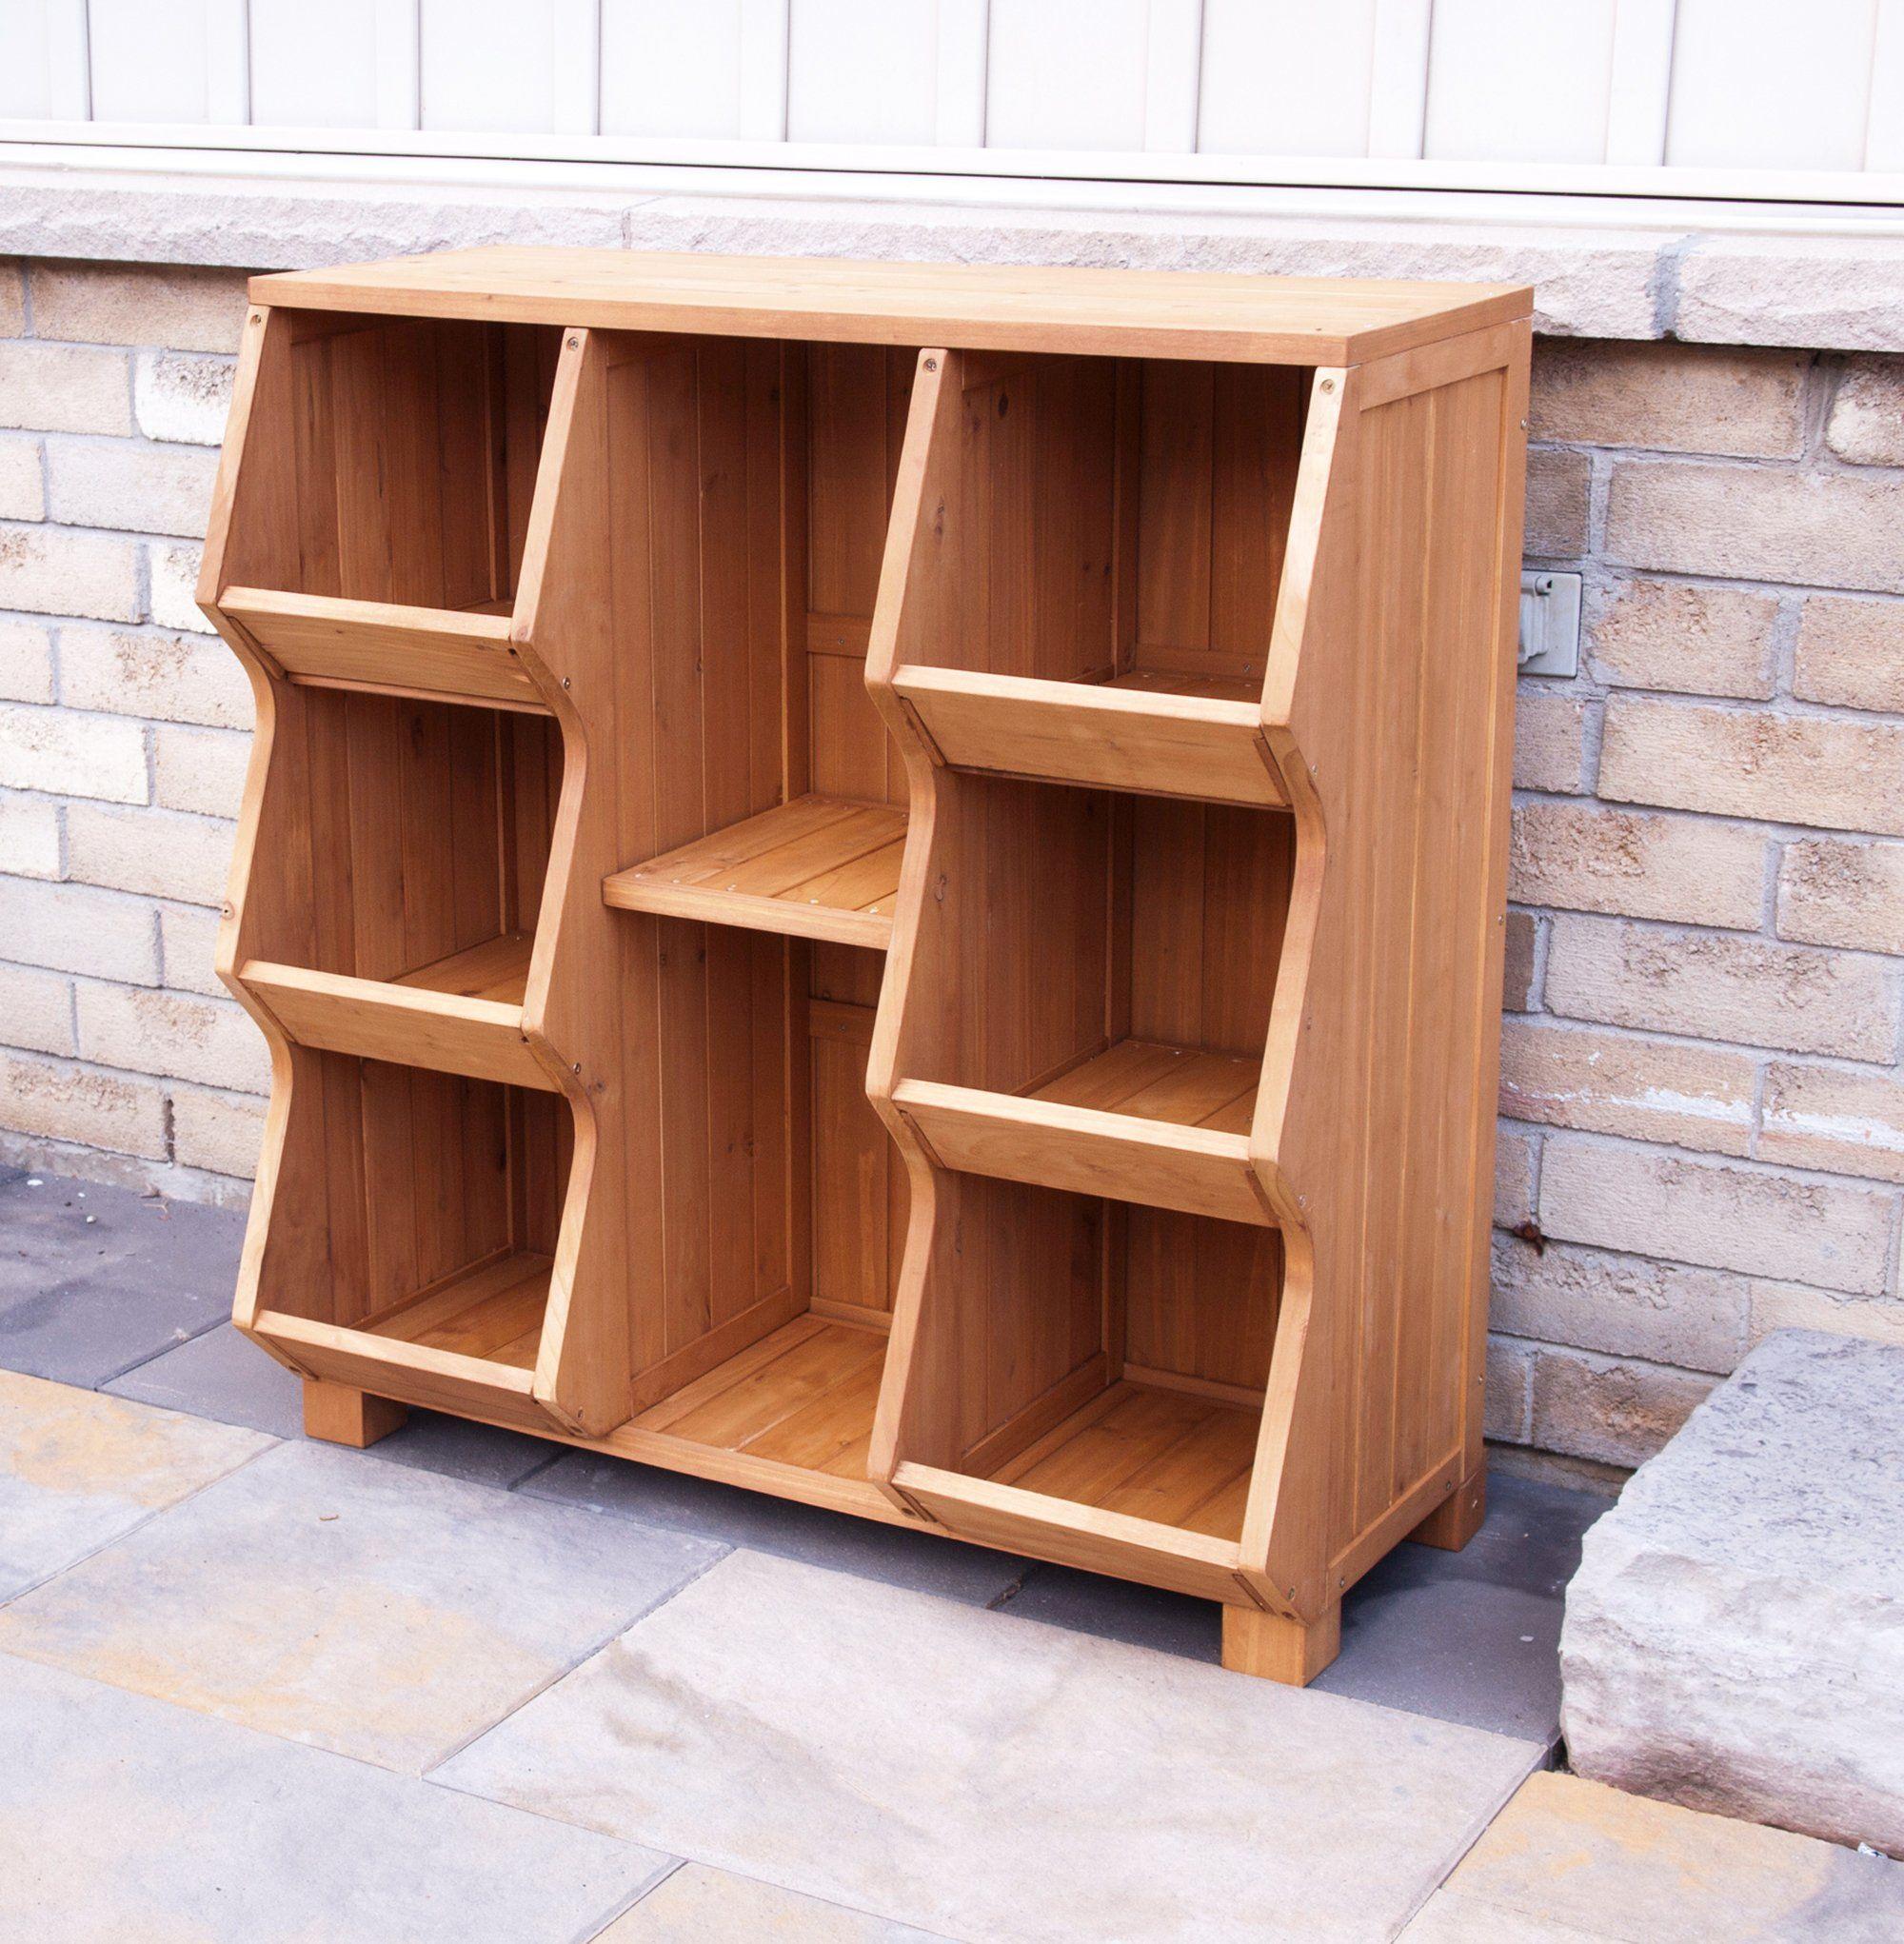 99 Amazon Com Cubby Storage Unit Furniture Decor Wooden Cubby Cubby Storage Toy Storage